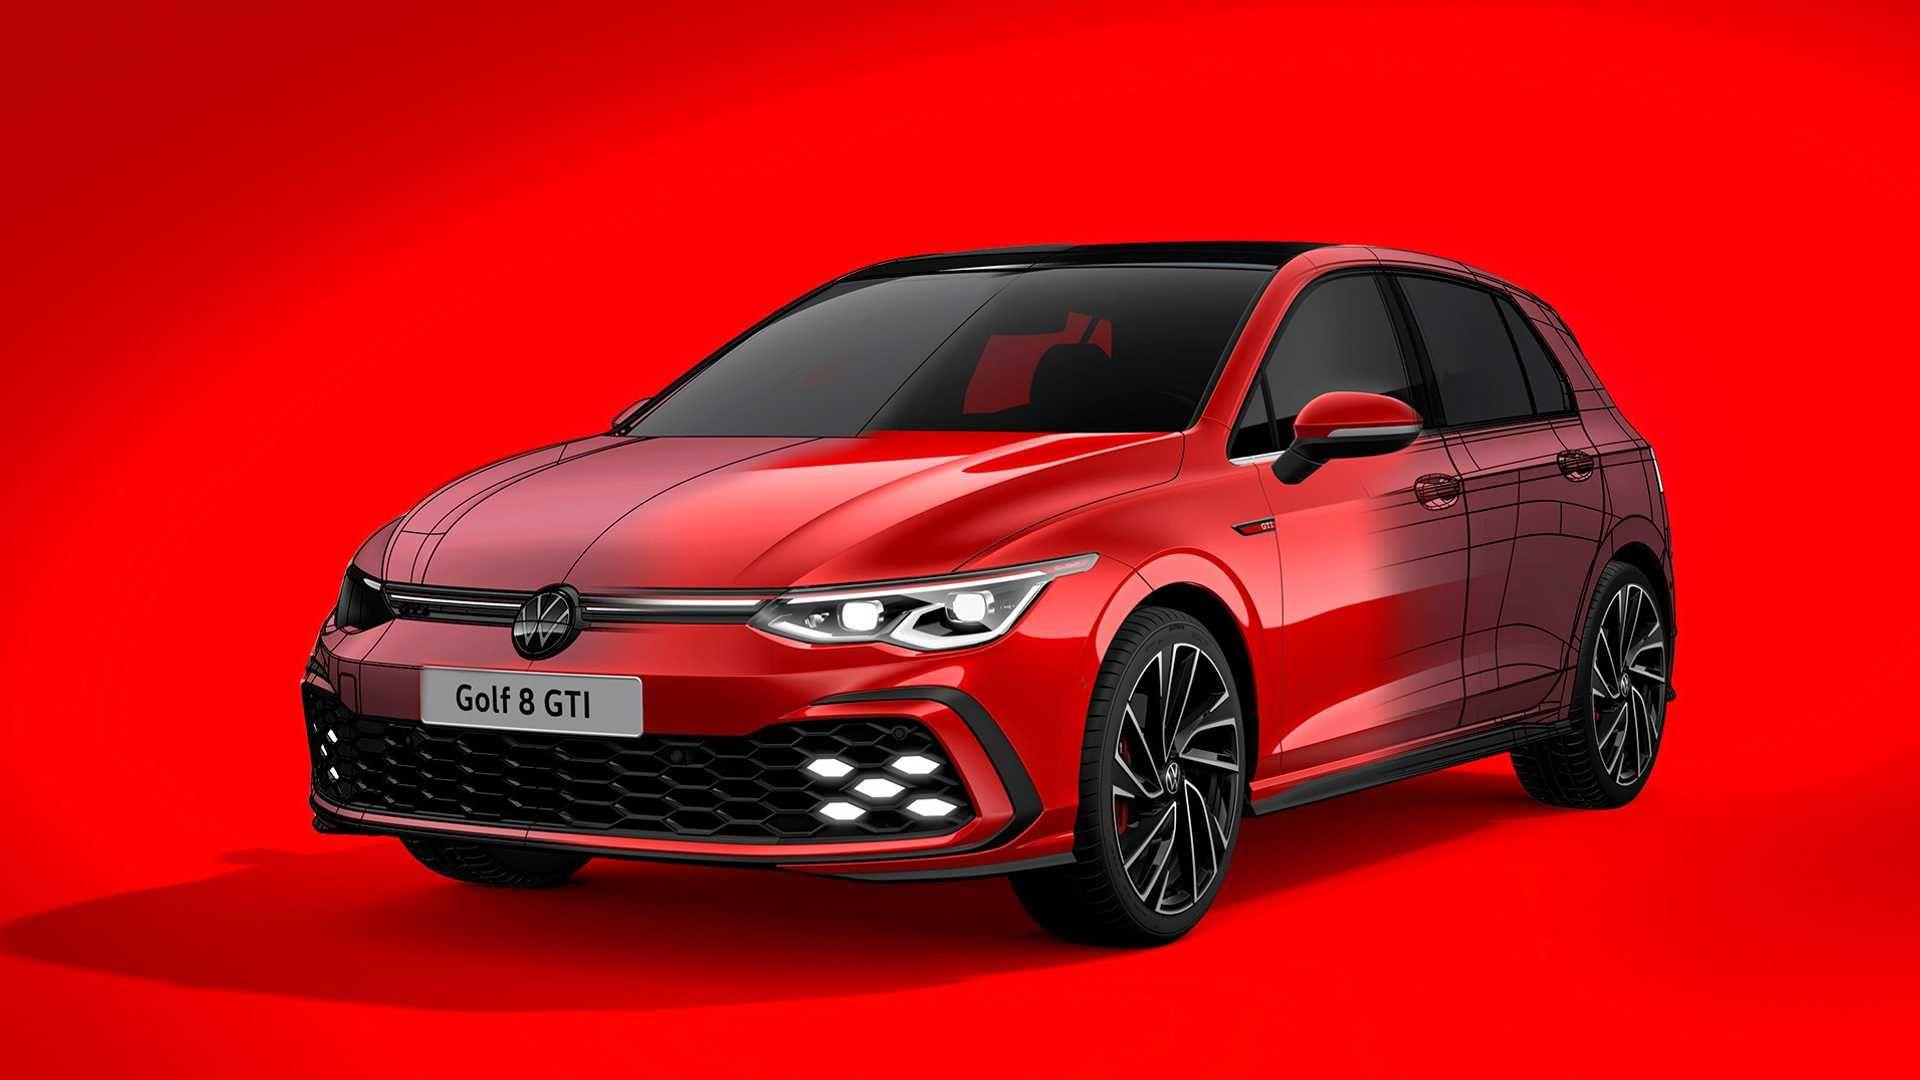 2022 Volkswagen Golf Gtd In 2021 Golf Gti Volkswagen Gti